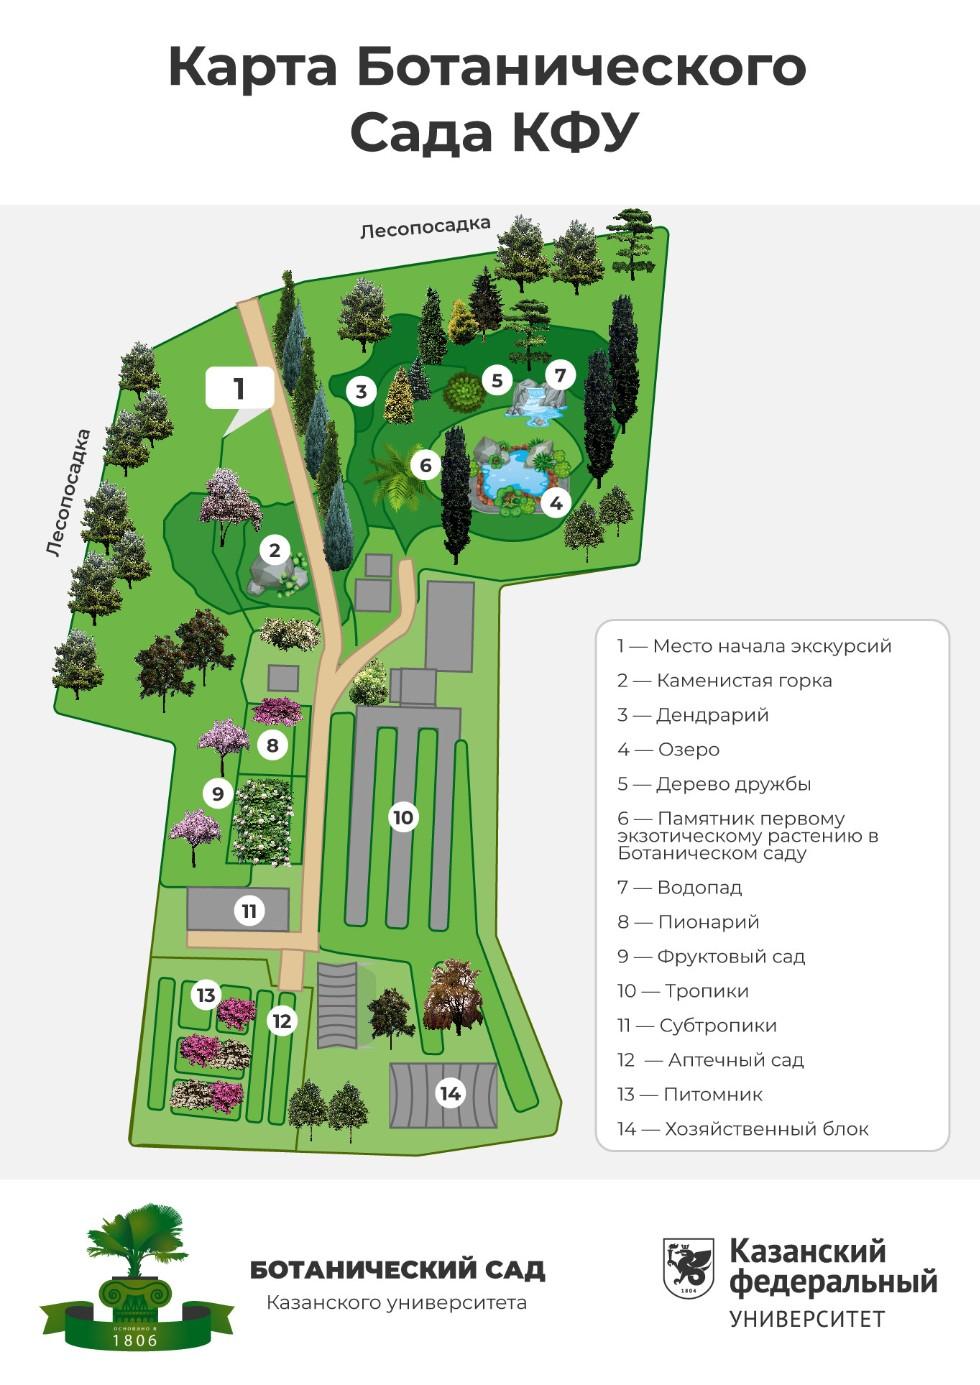 Карта-схема Ботанического сада